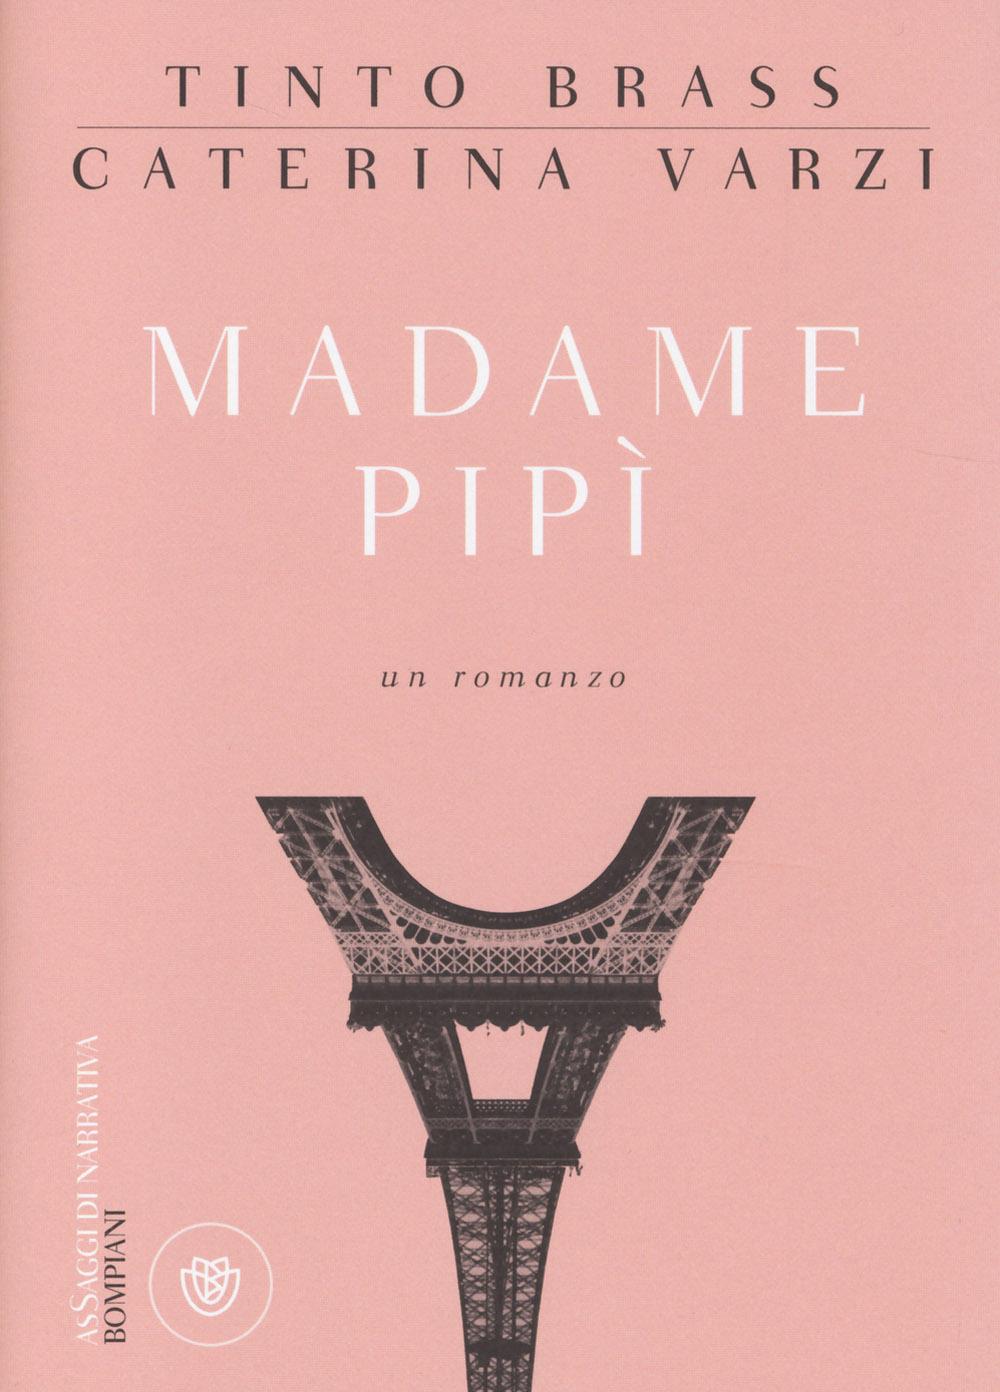 Madame Pipì